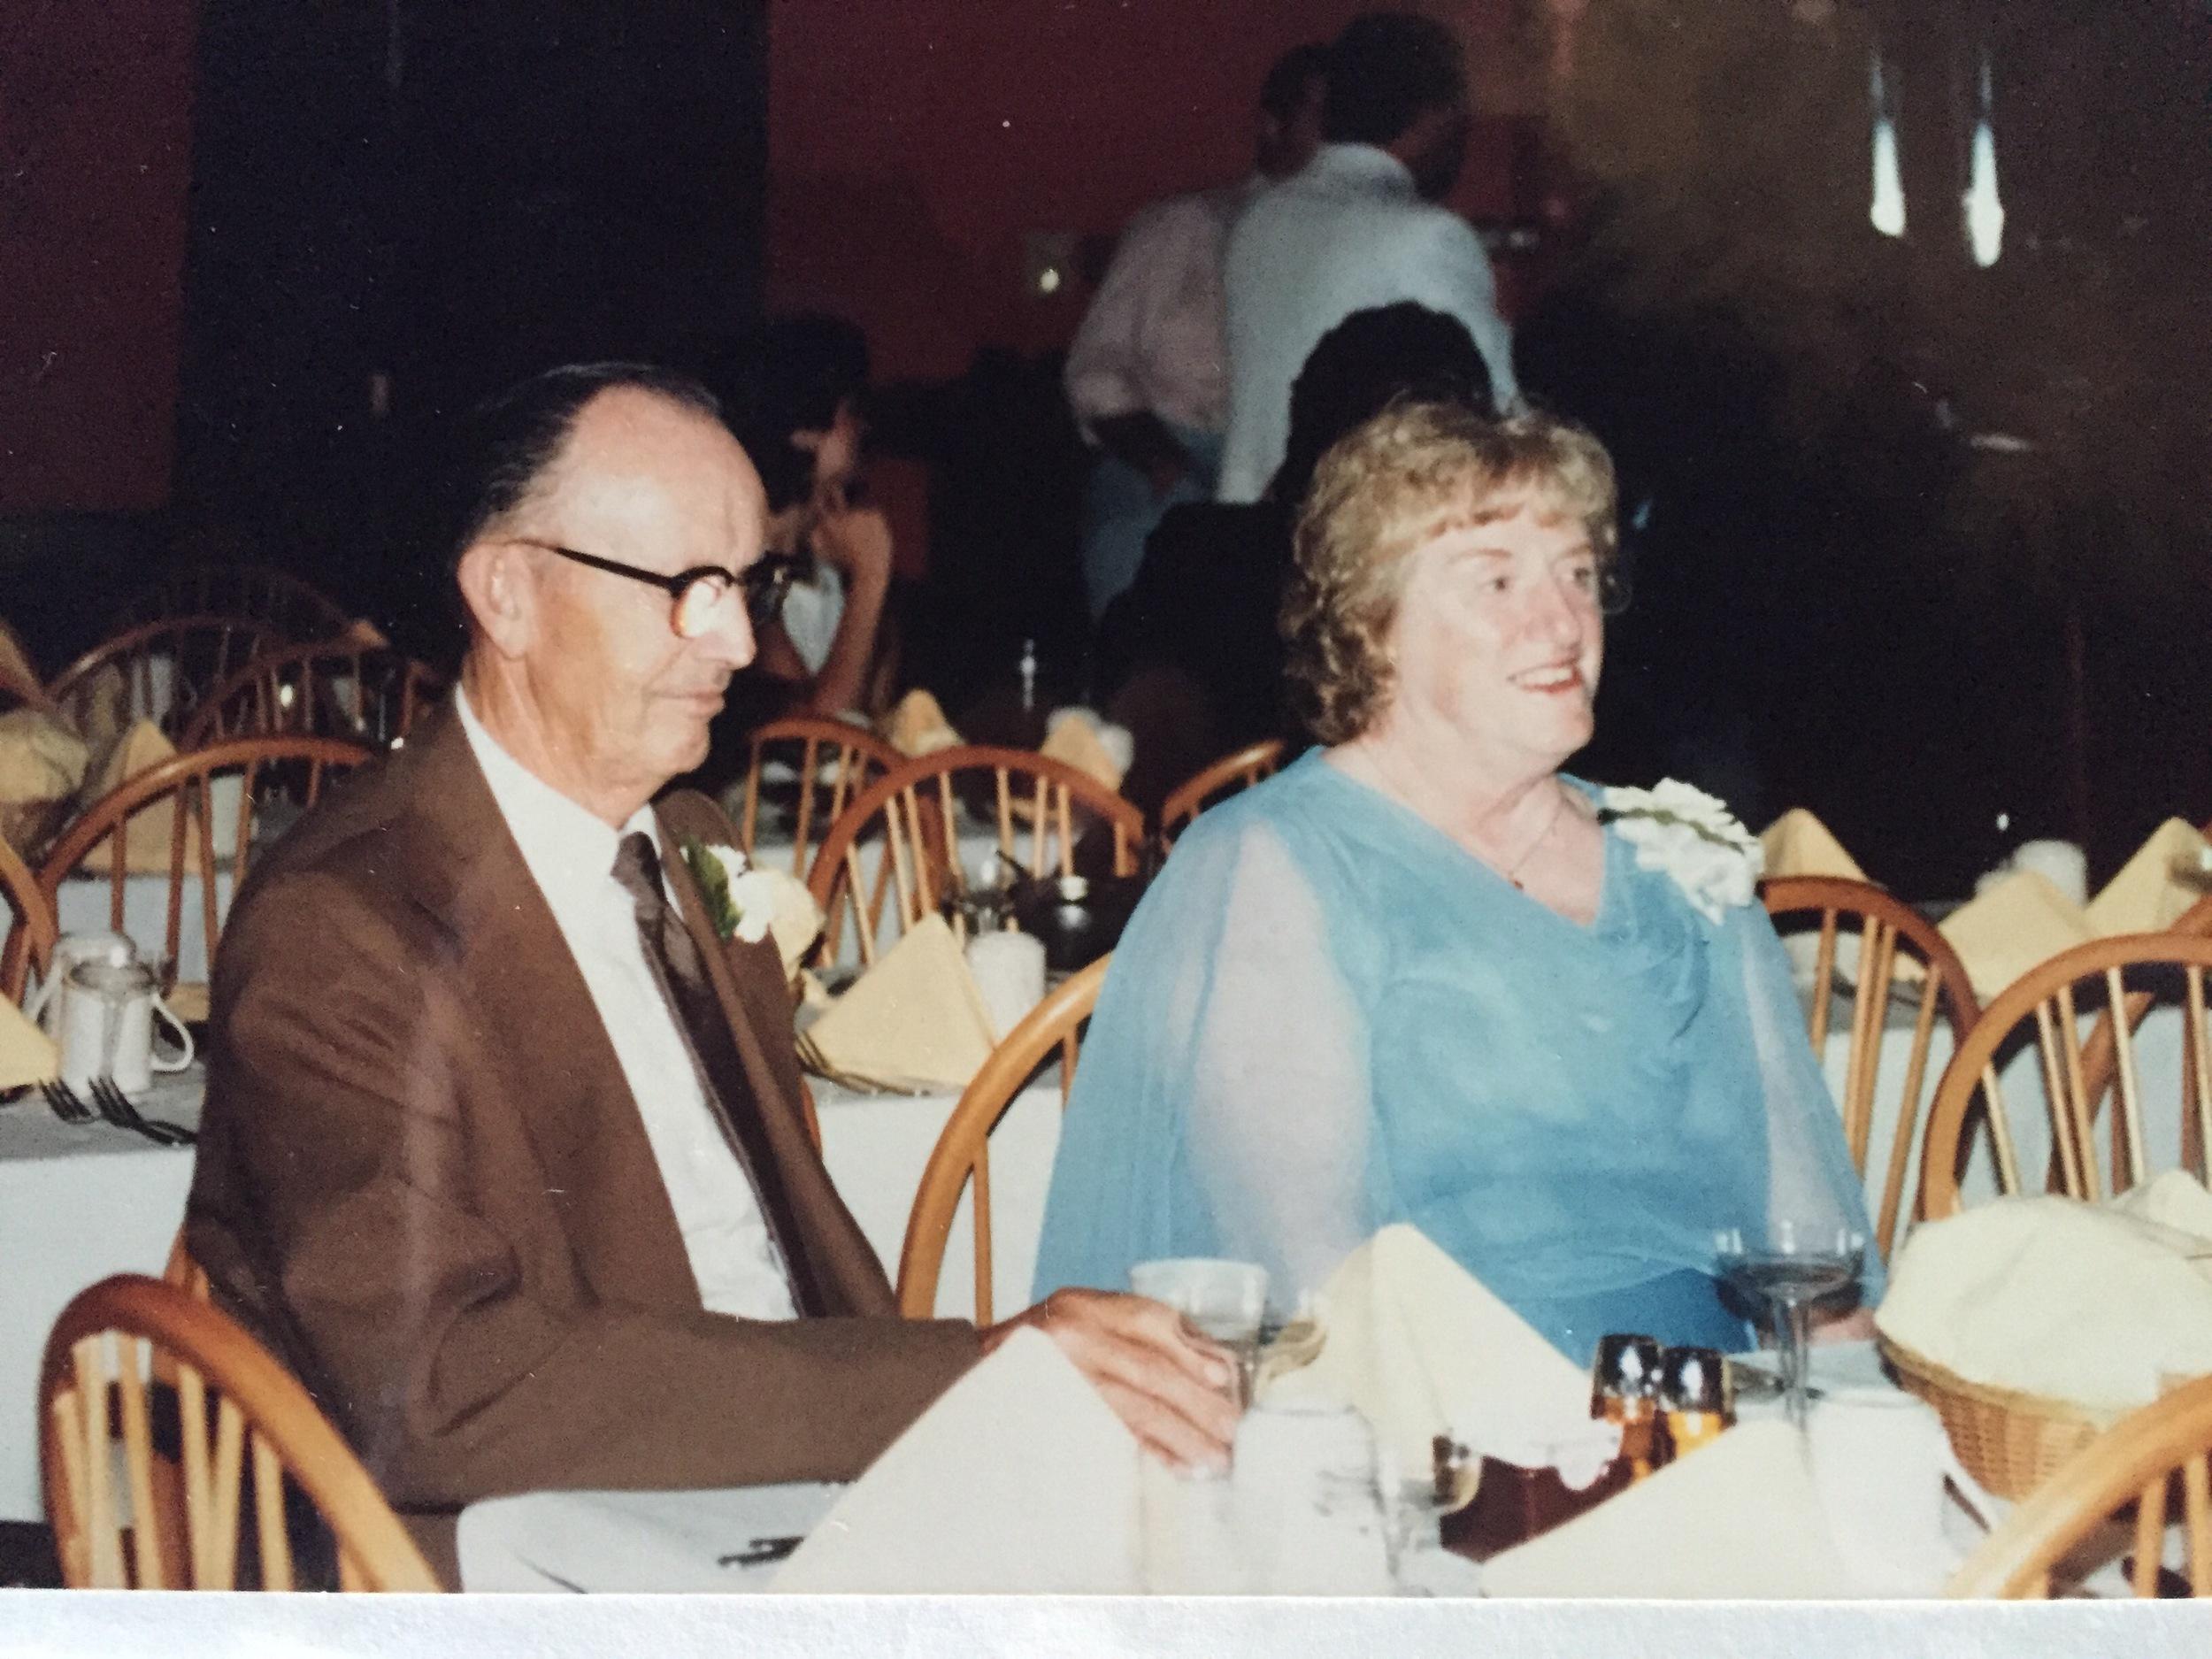 My other set of Grandparents: Willard and Bernadine